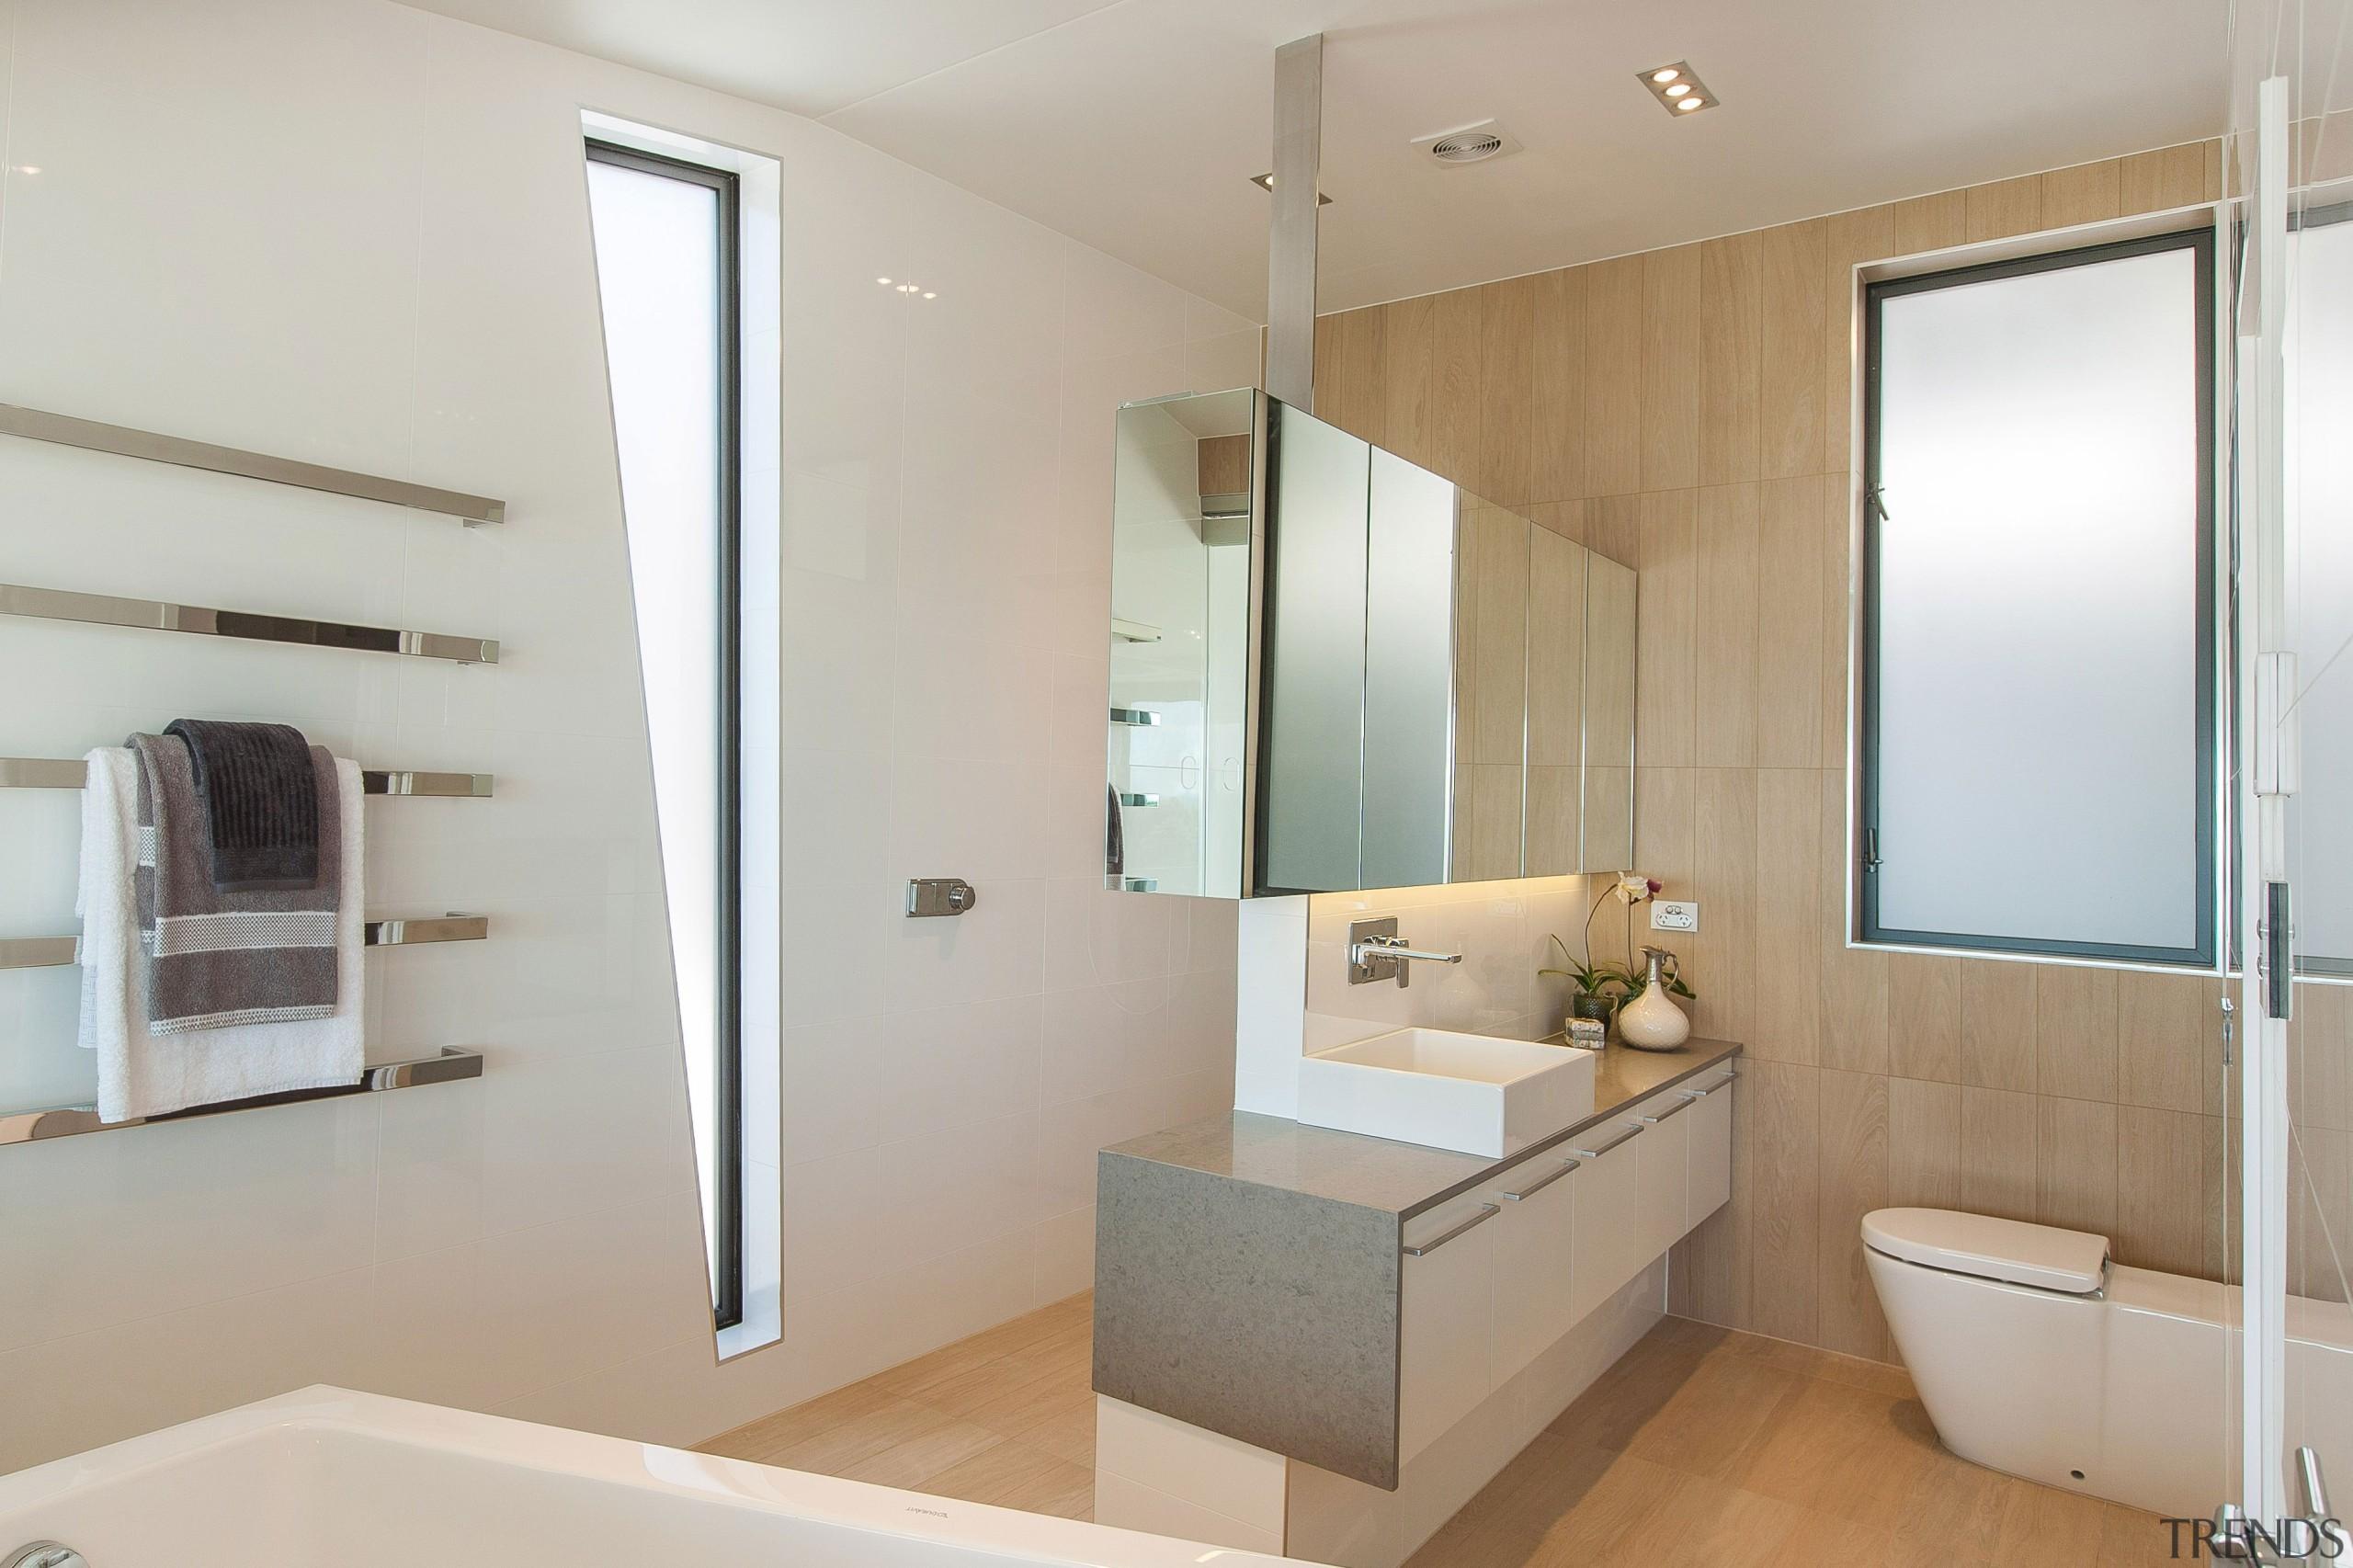 See the range here https://www.fairviewwindows.co.nz/windows/ bathroom, floor, home, interior design, property, real estate, room, sink, window, gray